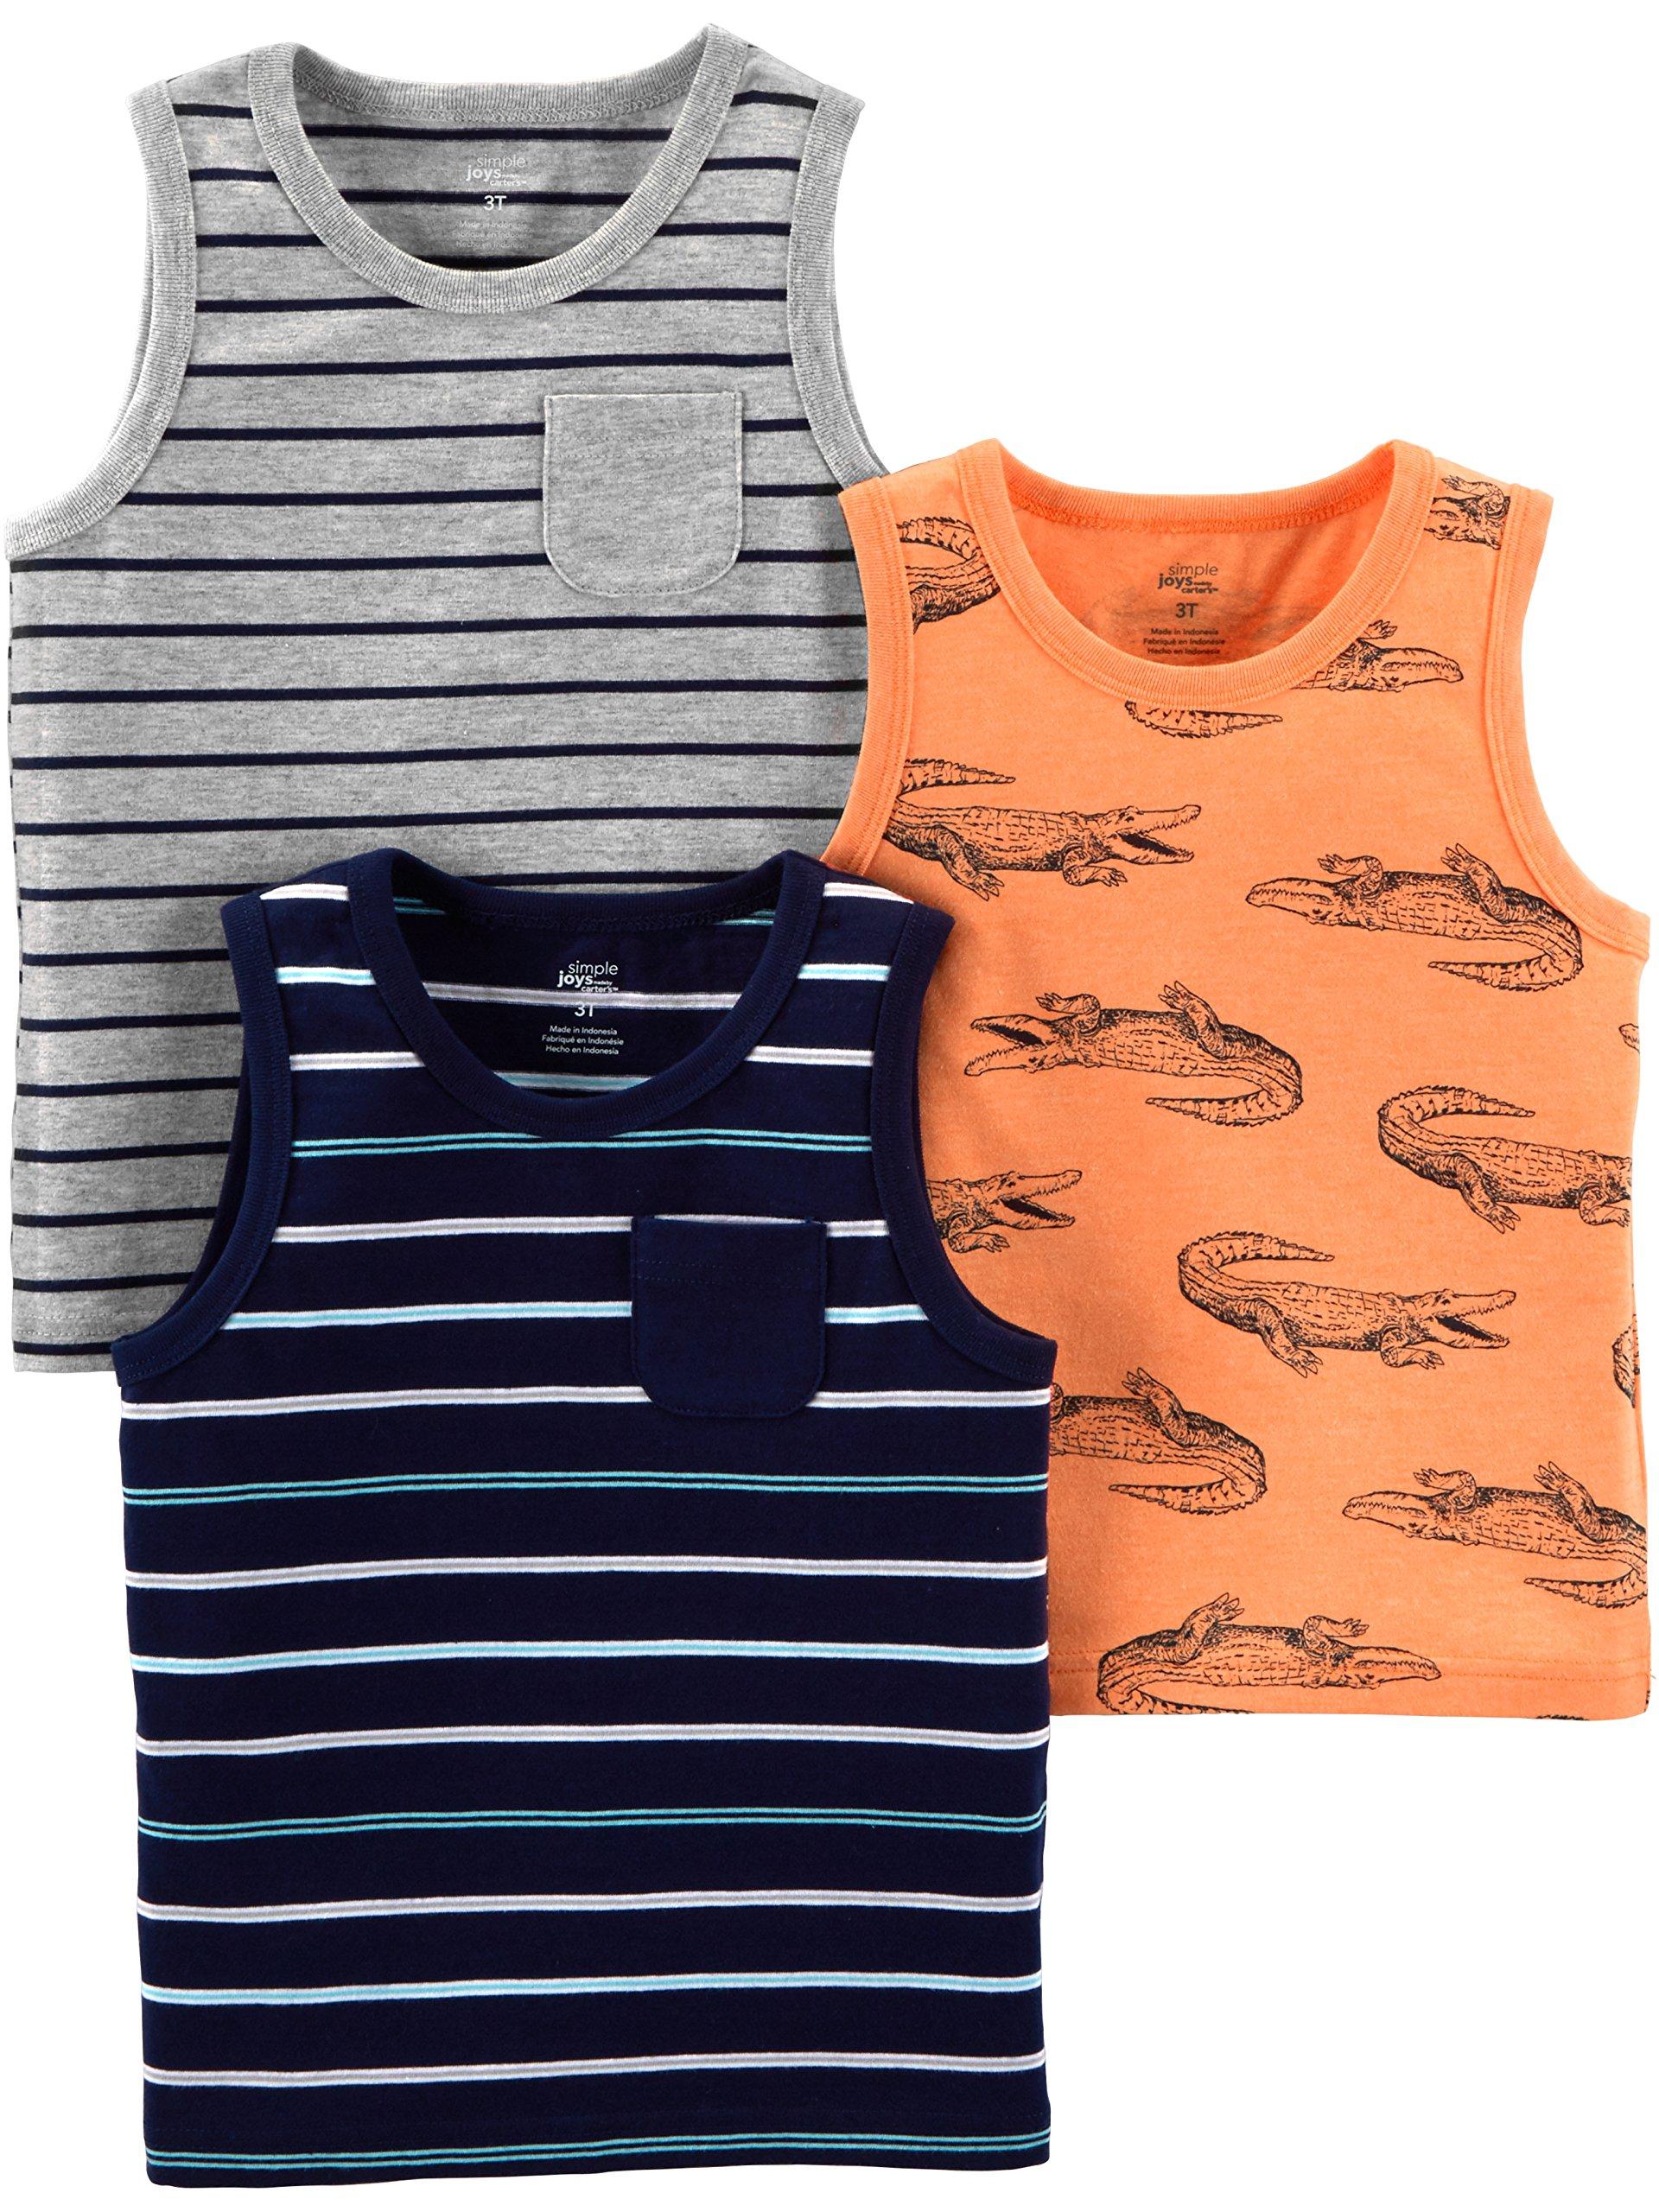 Simple Joys by Carter's Boys' Toddler 3-Pack Tank Tops, Blue Orange Gators/Gray Stripe, 4T